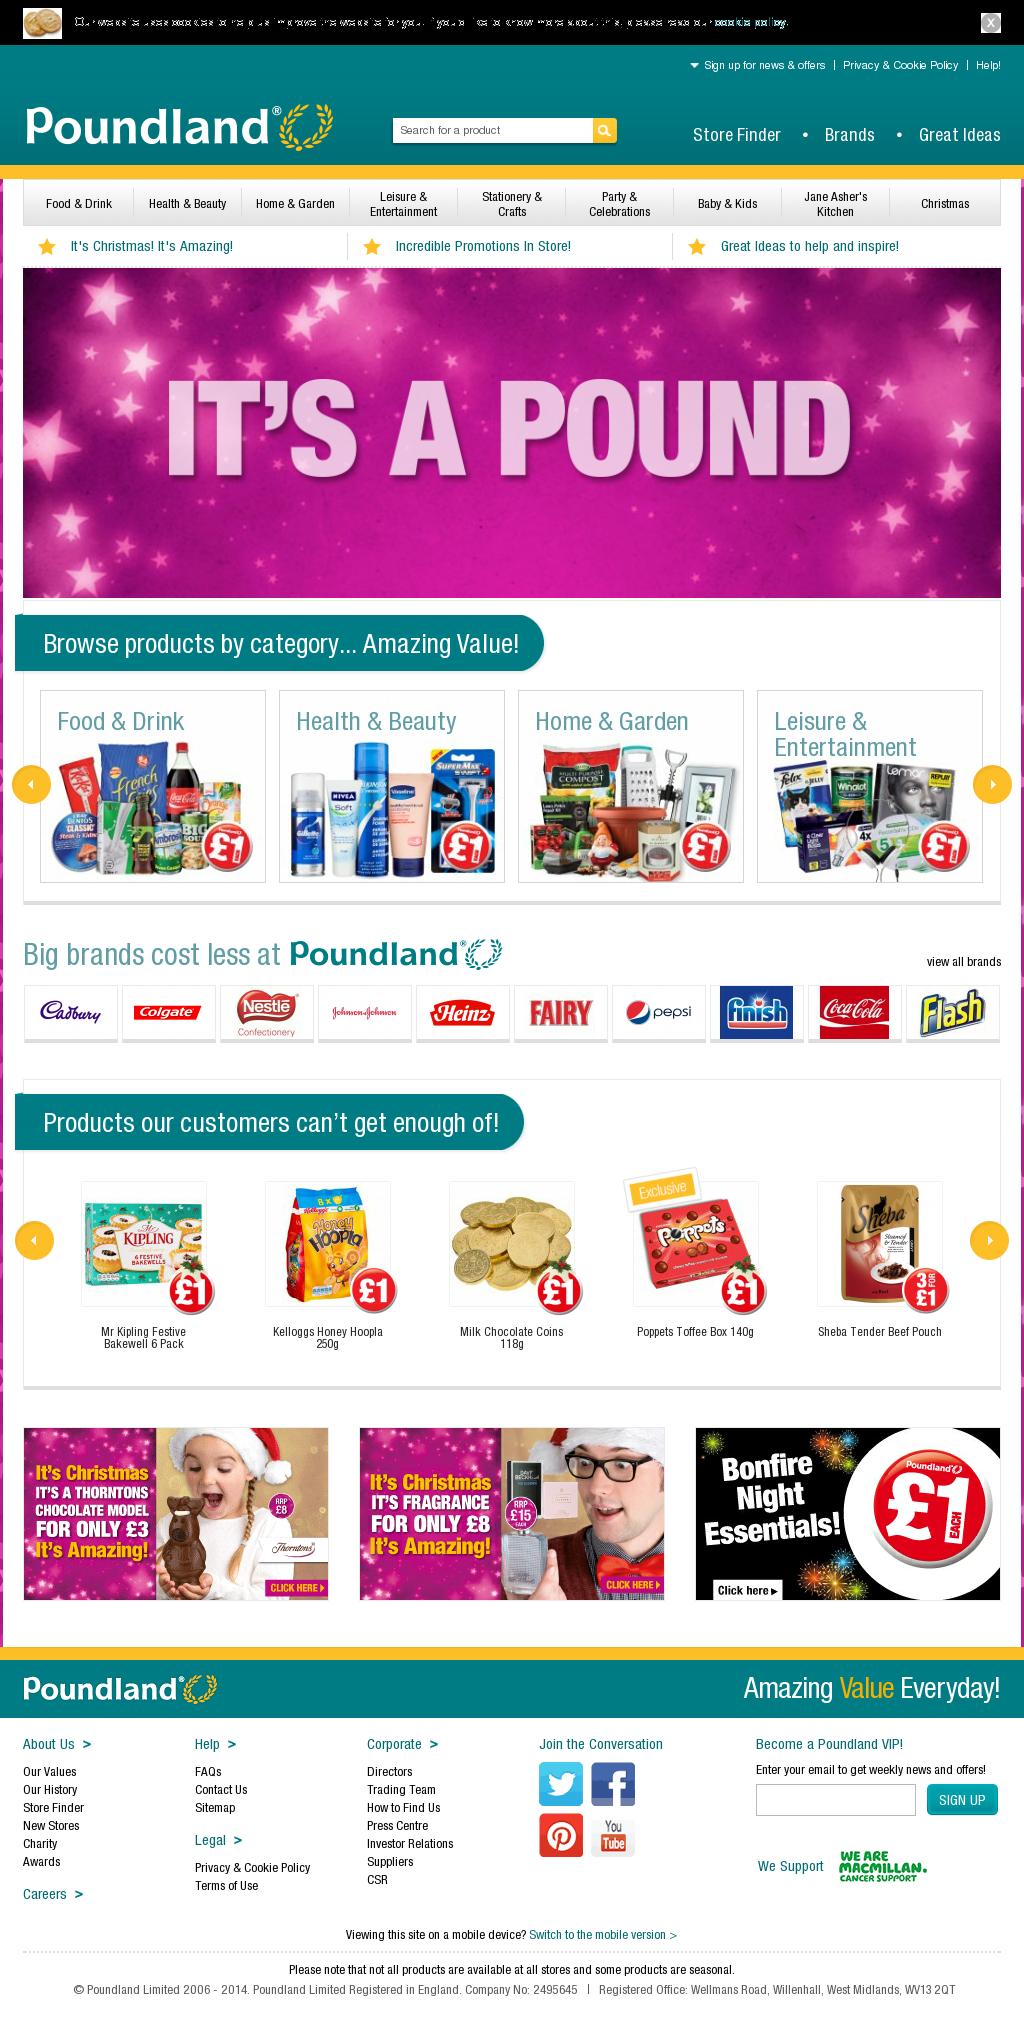 Poundland Competitors, Revenue and Employees - Owler Company Profile